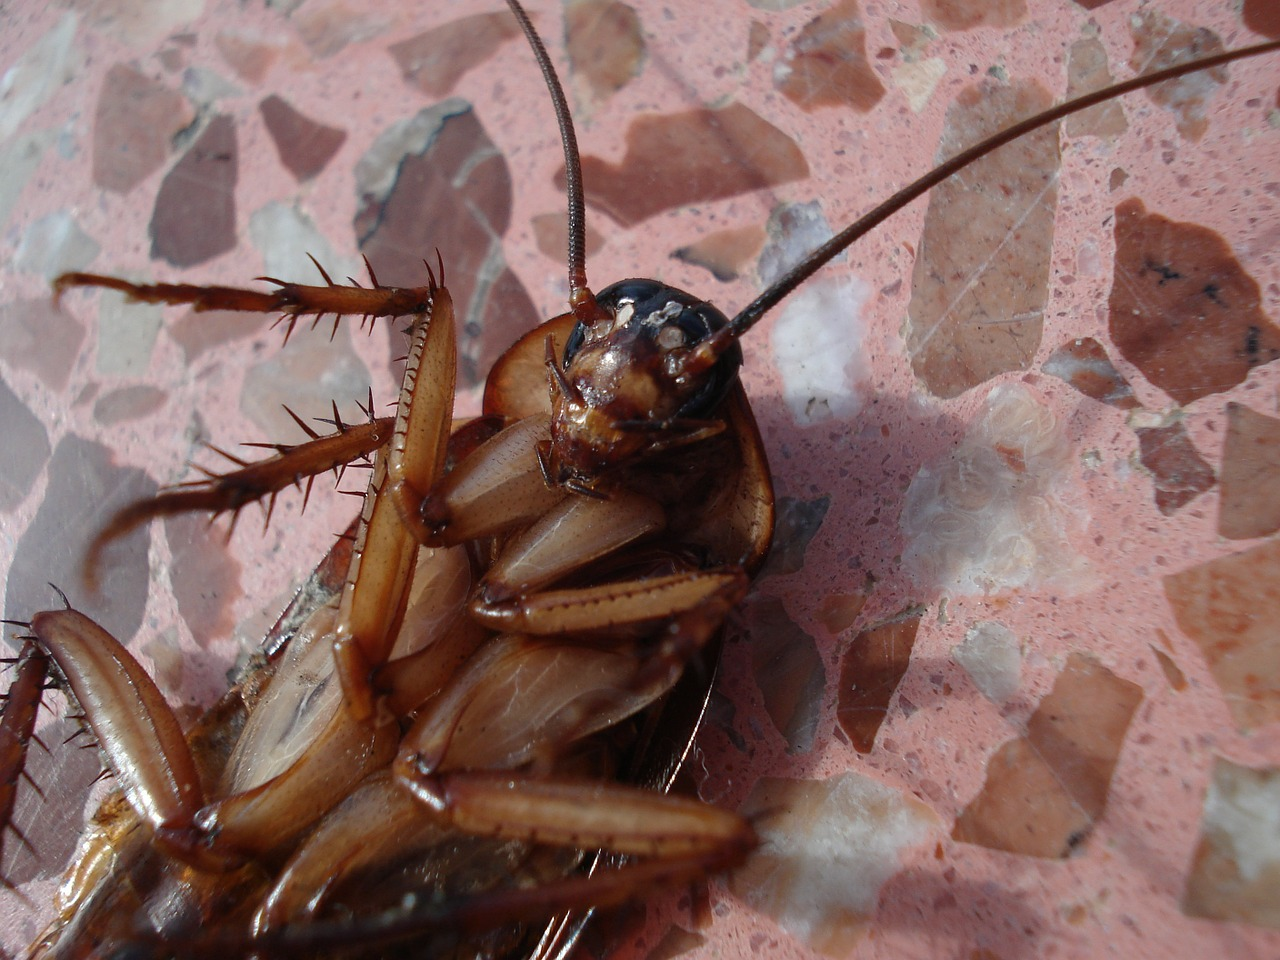 cockroach-15093_1280.jpg